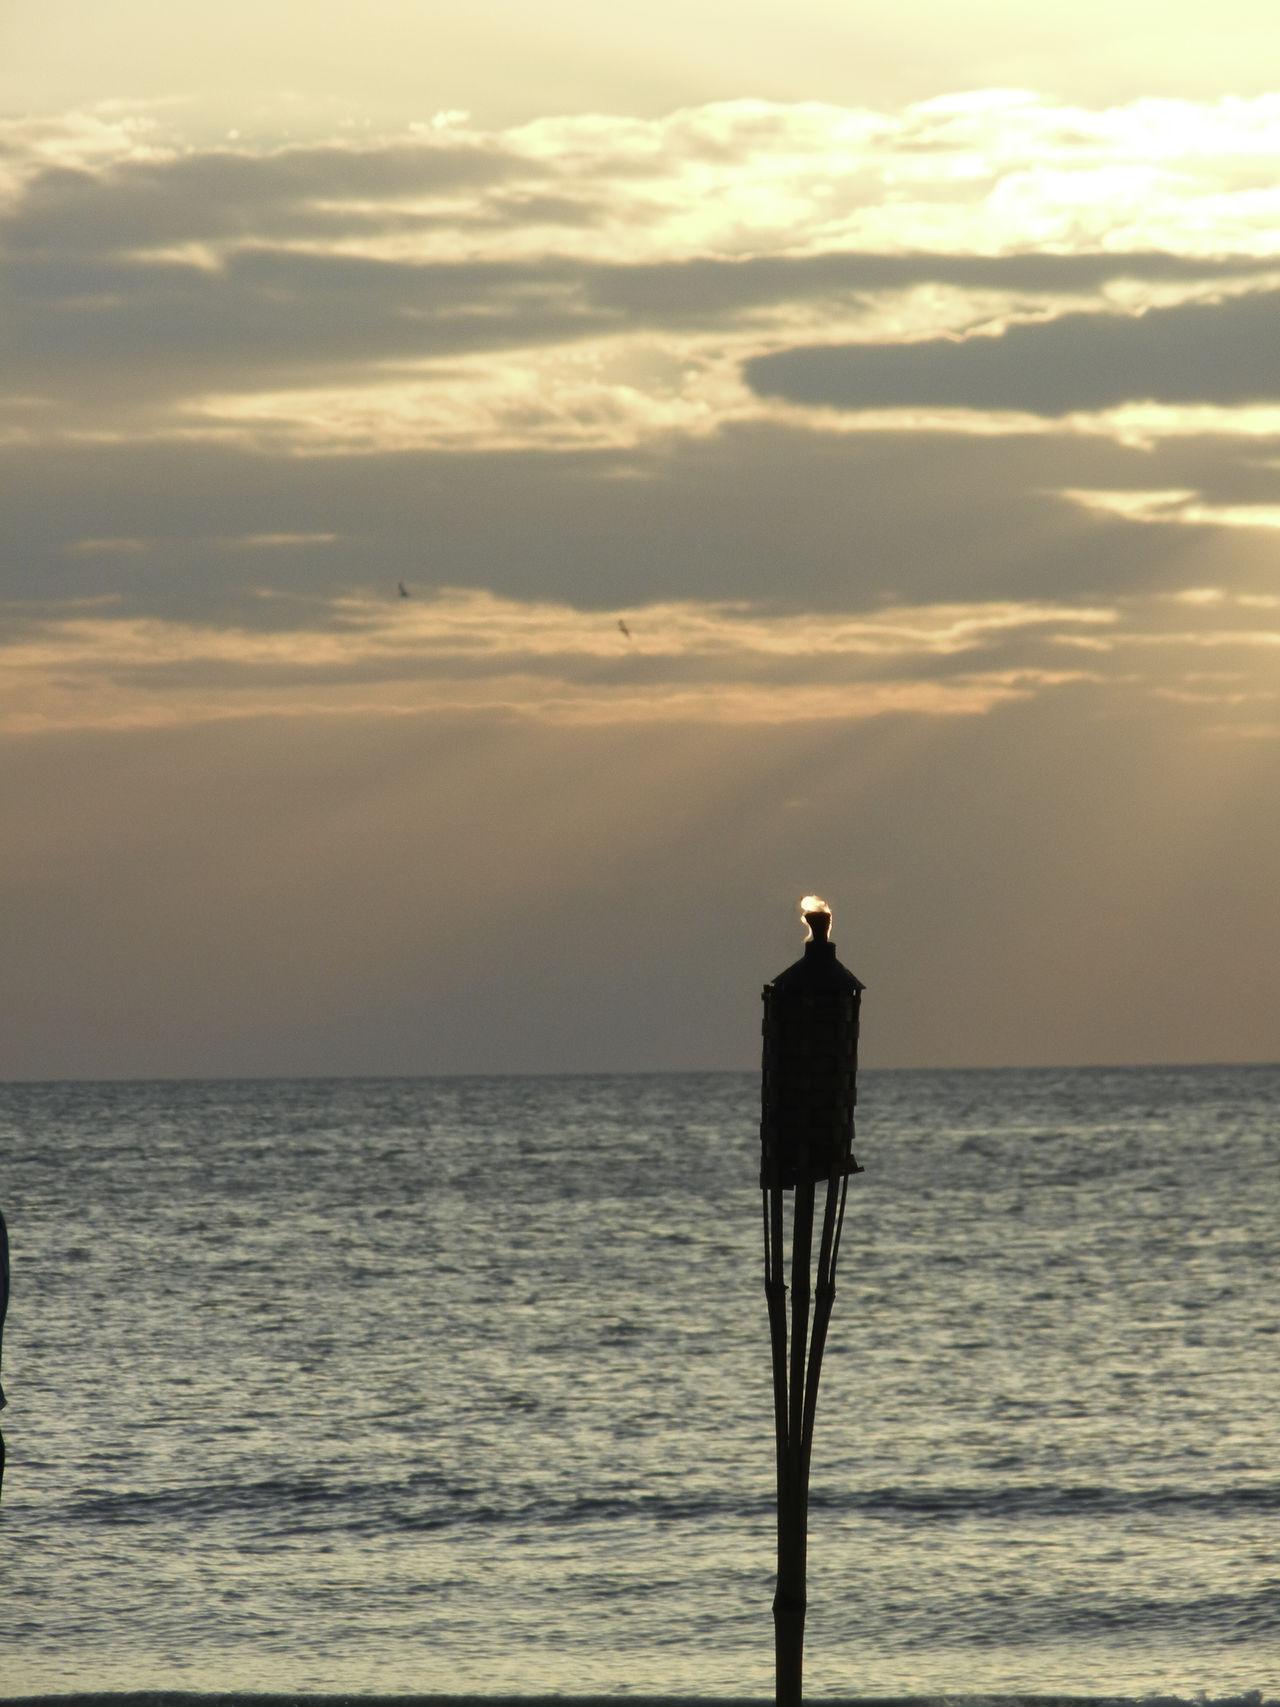 Flame of a tiki torch lantern captured against a coastal sunset. Beach Beachphotography Cloud Coastal Dramatic Sky Dusk Flame Getting Away From It All Horizon Over Water Lantern Light Moody Sky Ocean Outdoors Scenics Sea Seascape Sky Sun Sunrays Sunset Sunset Silhouettes Tiki Torch Torch Tropical